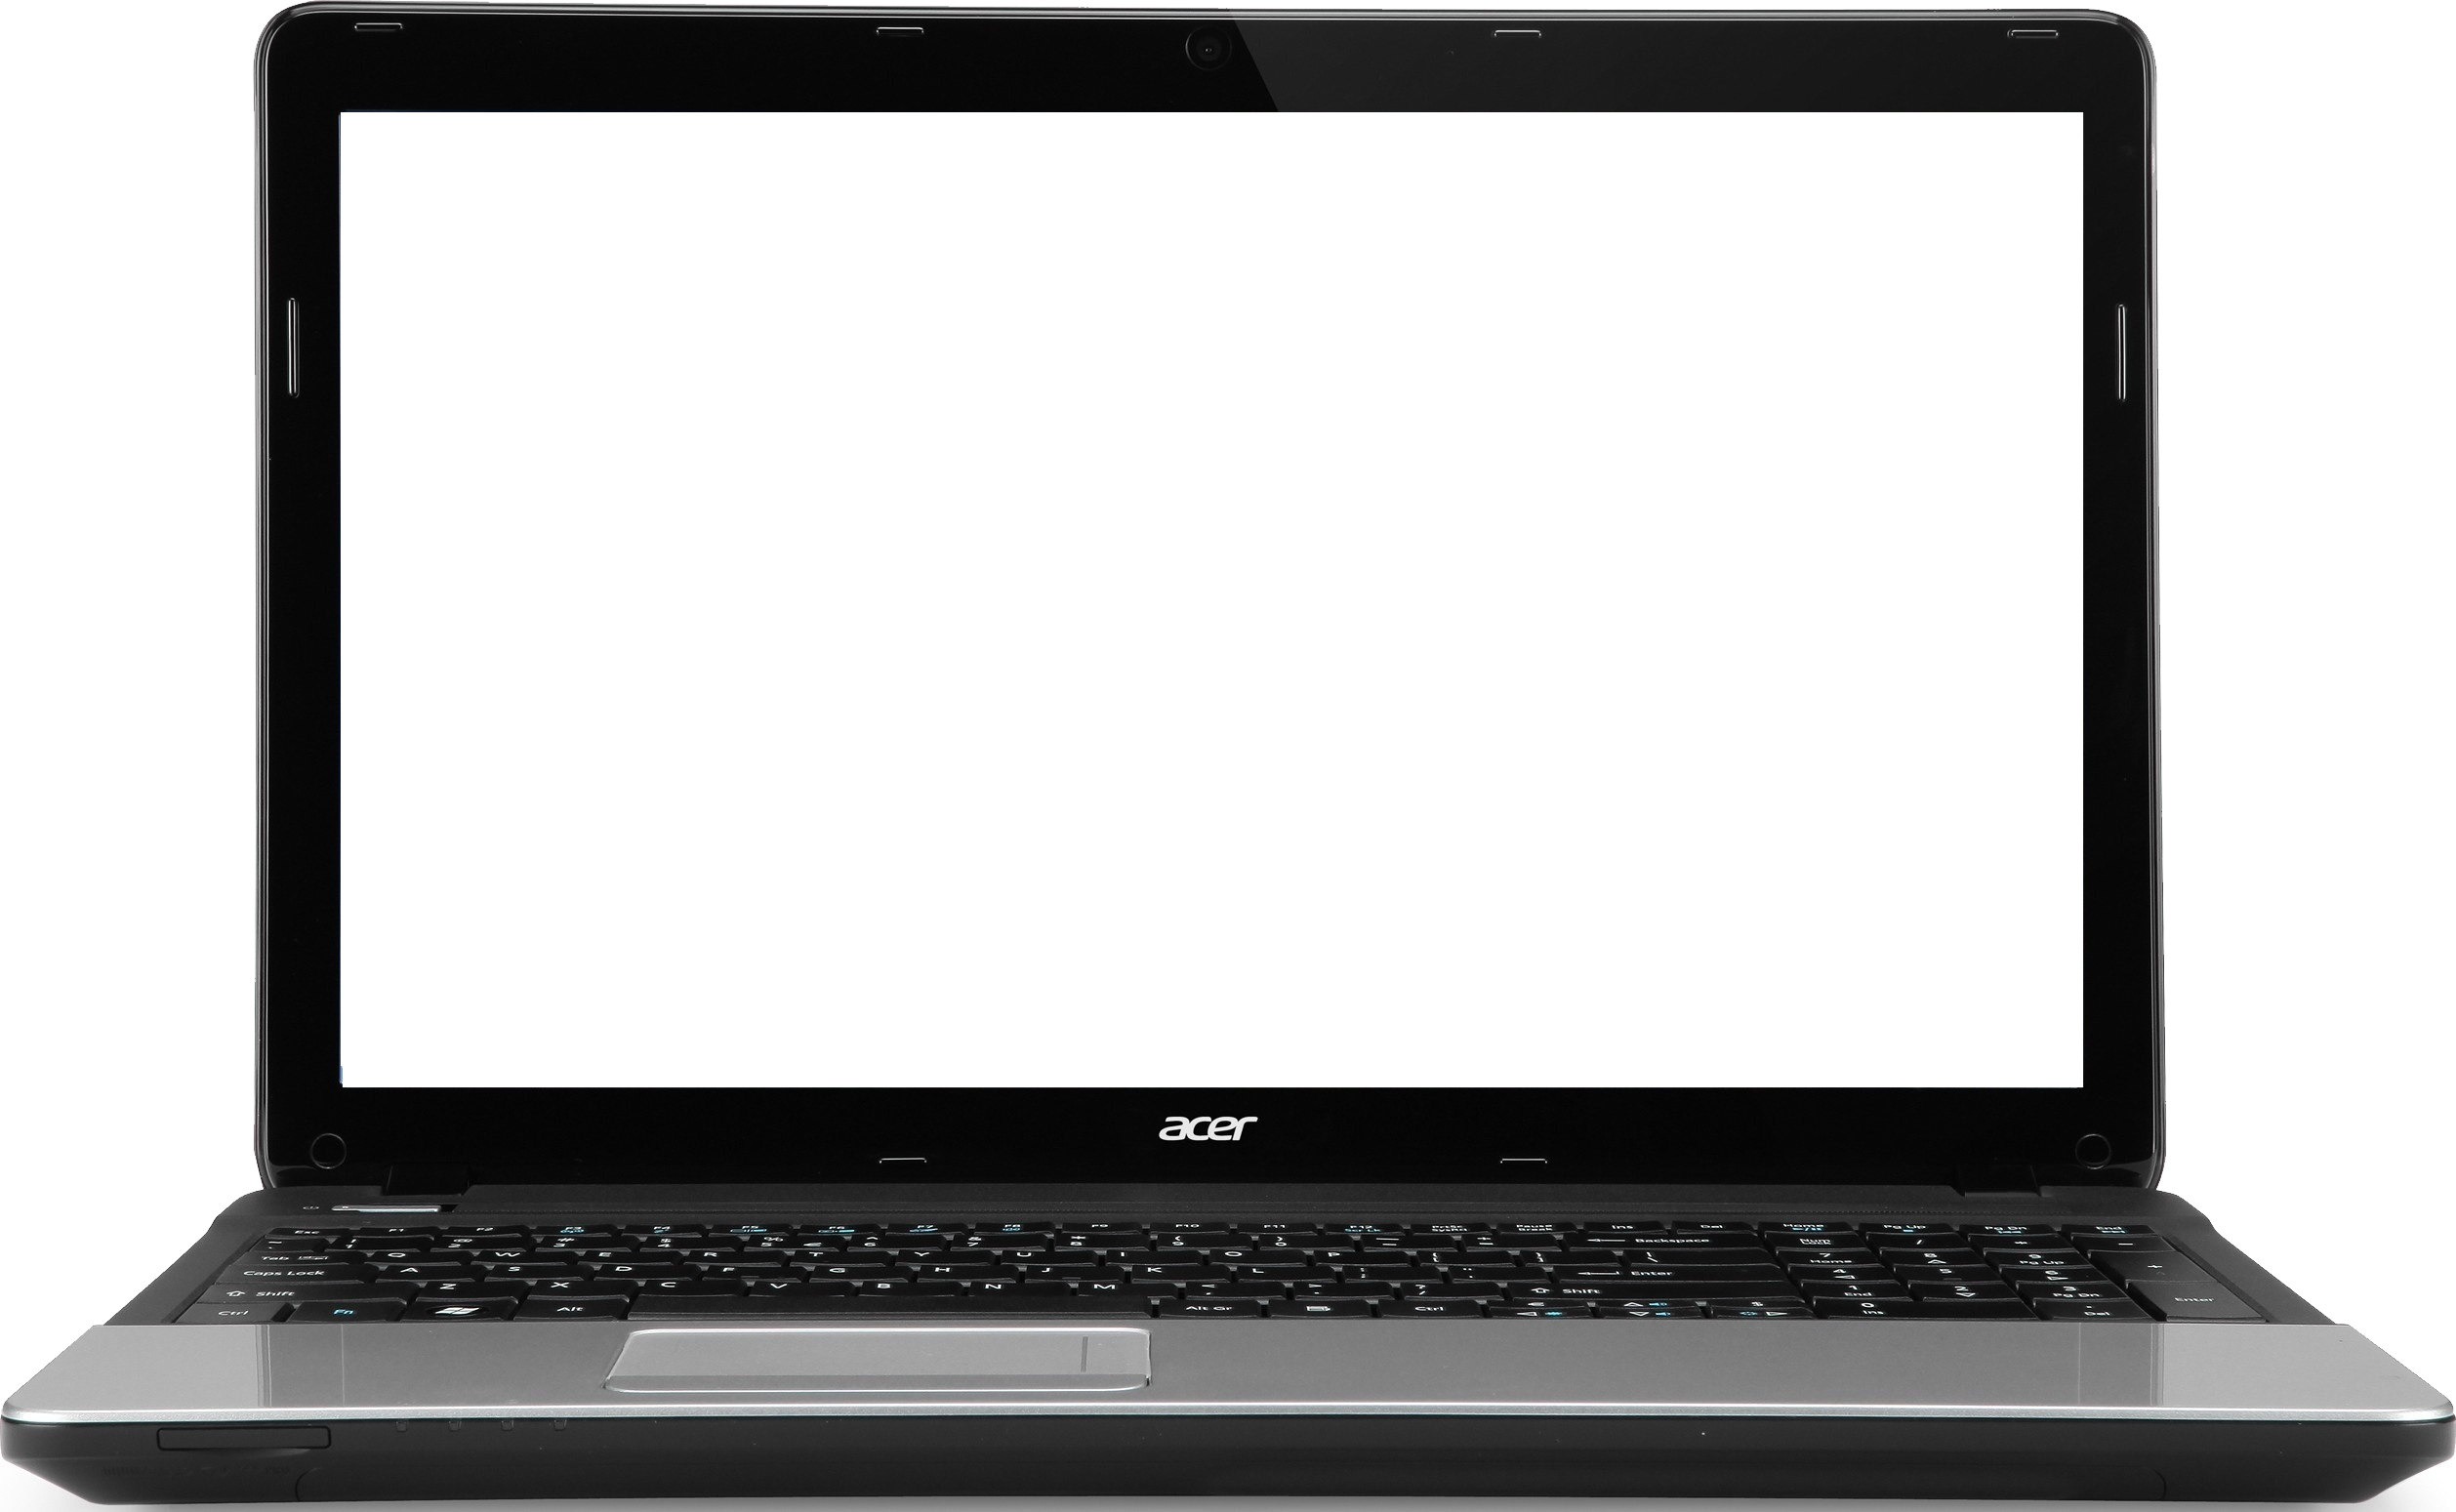 Laptops images notebook image laptop clip art